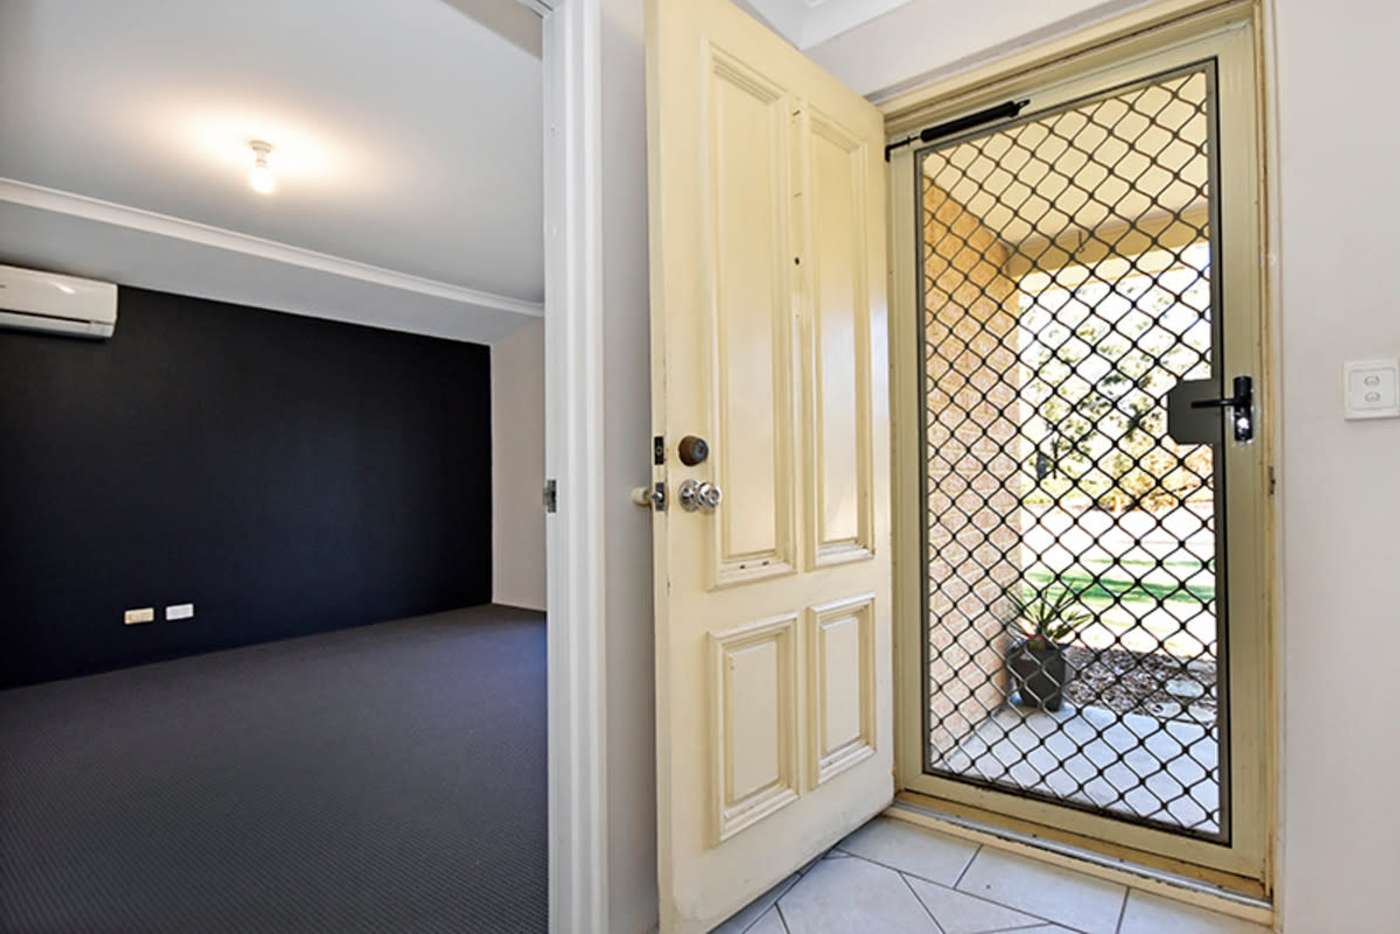 Seventh view of Homely house listing, 25 Simla Place, Caversham WA 6055